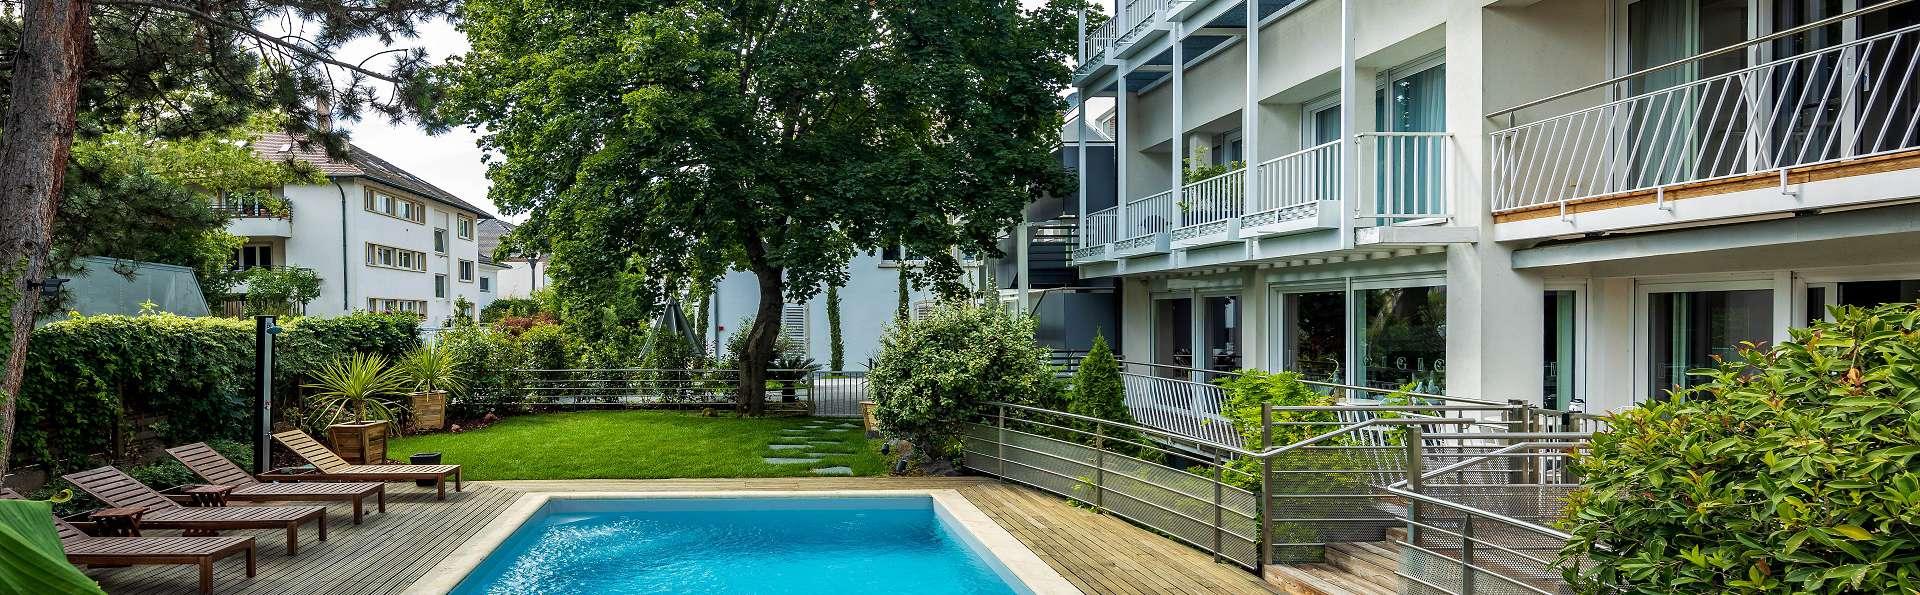 Garrigae Villa La Florangerie - EDIT_ext_piscine_6.jpg